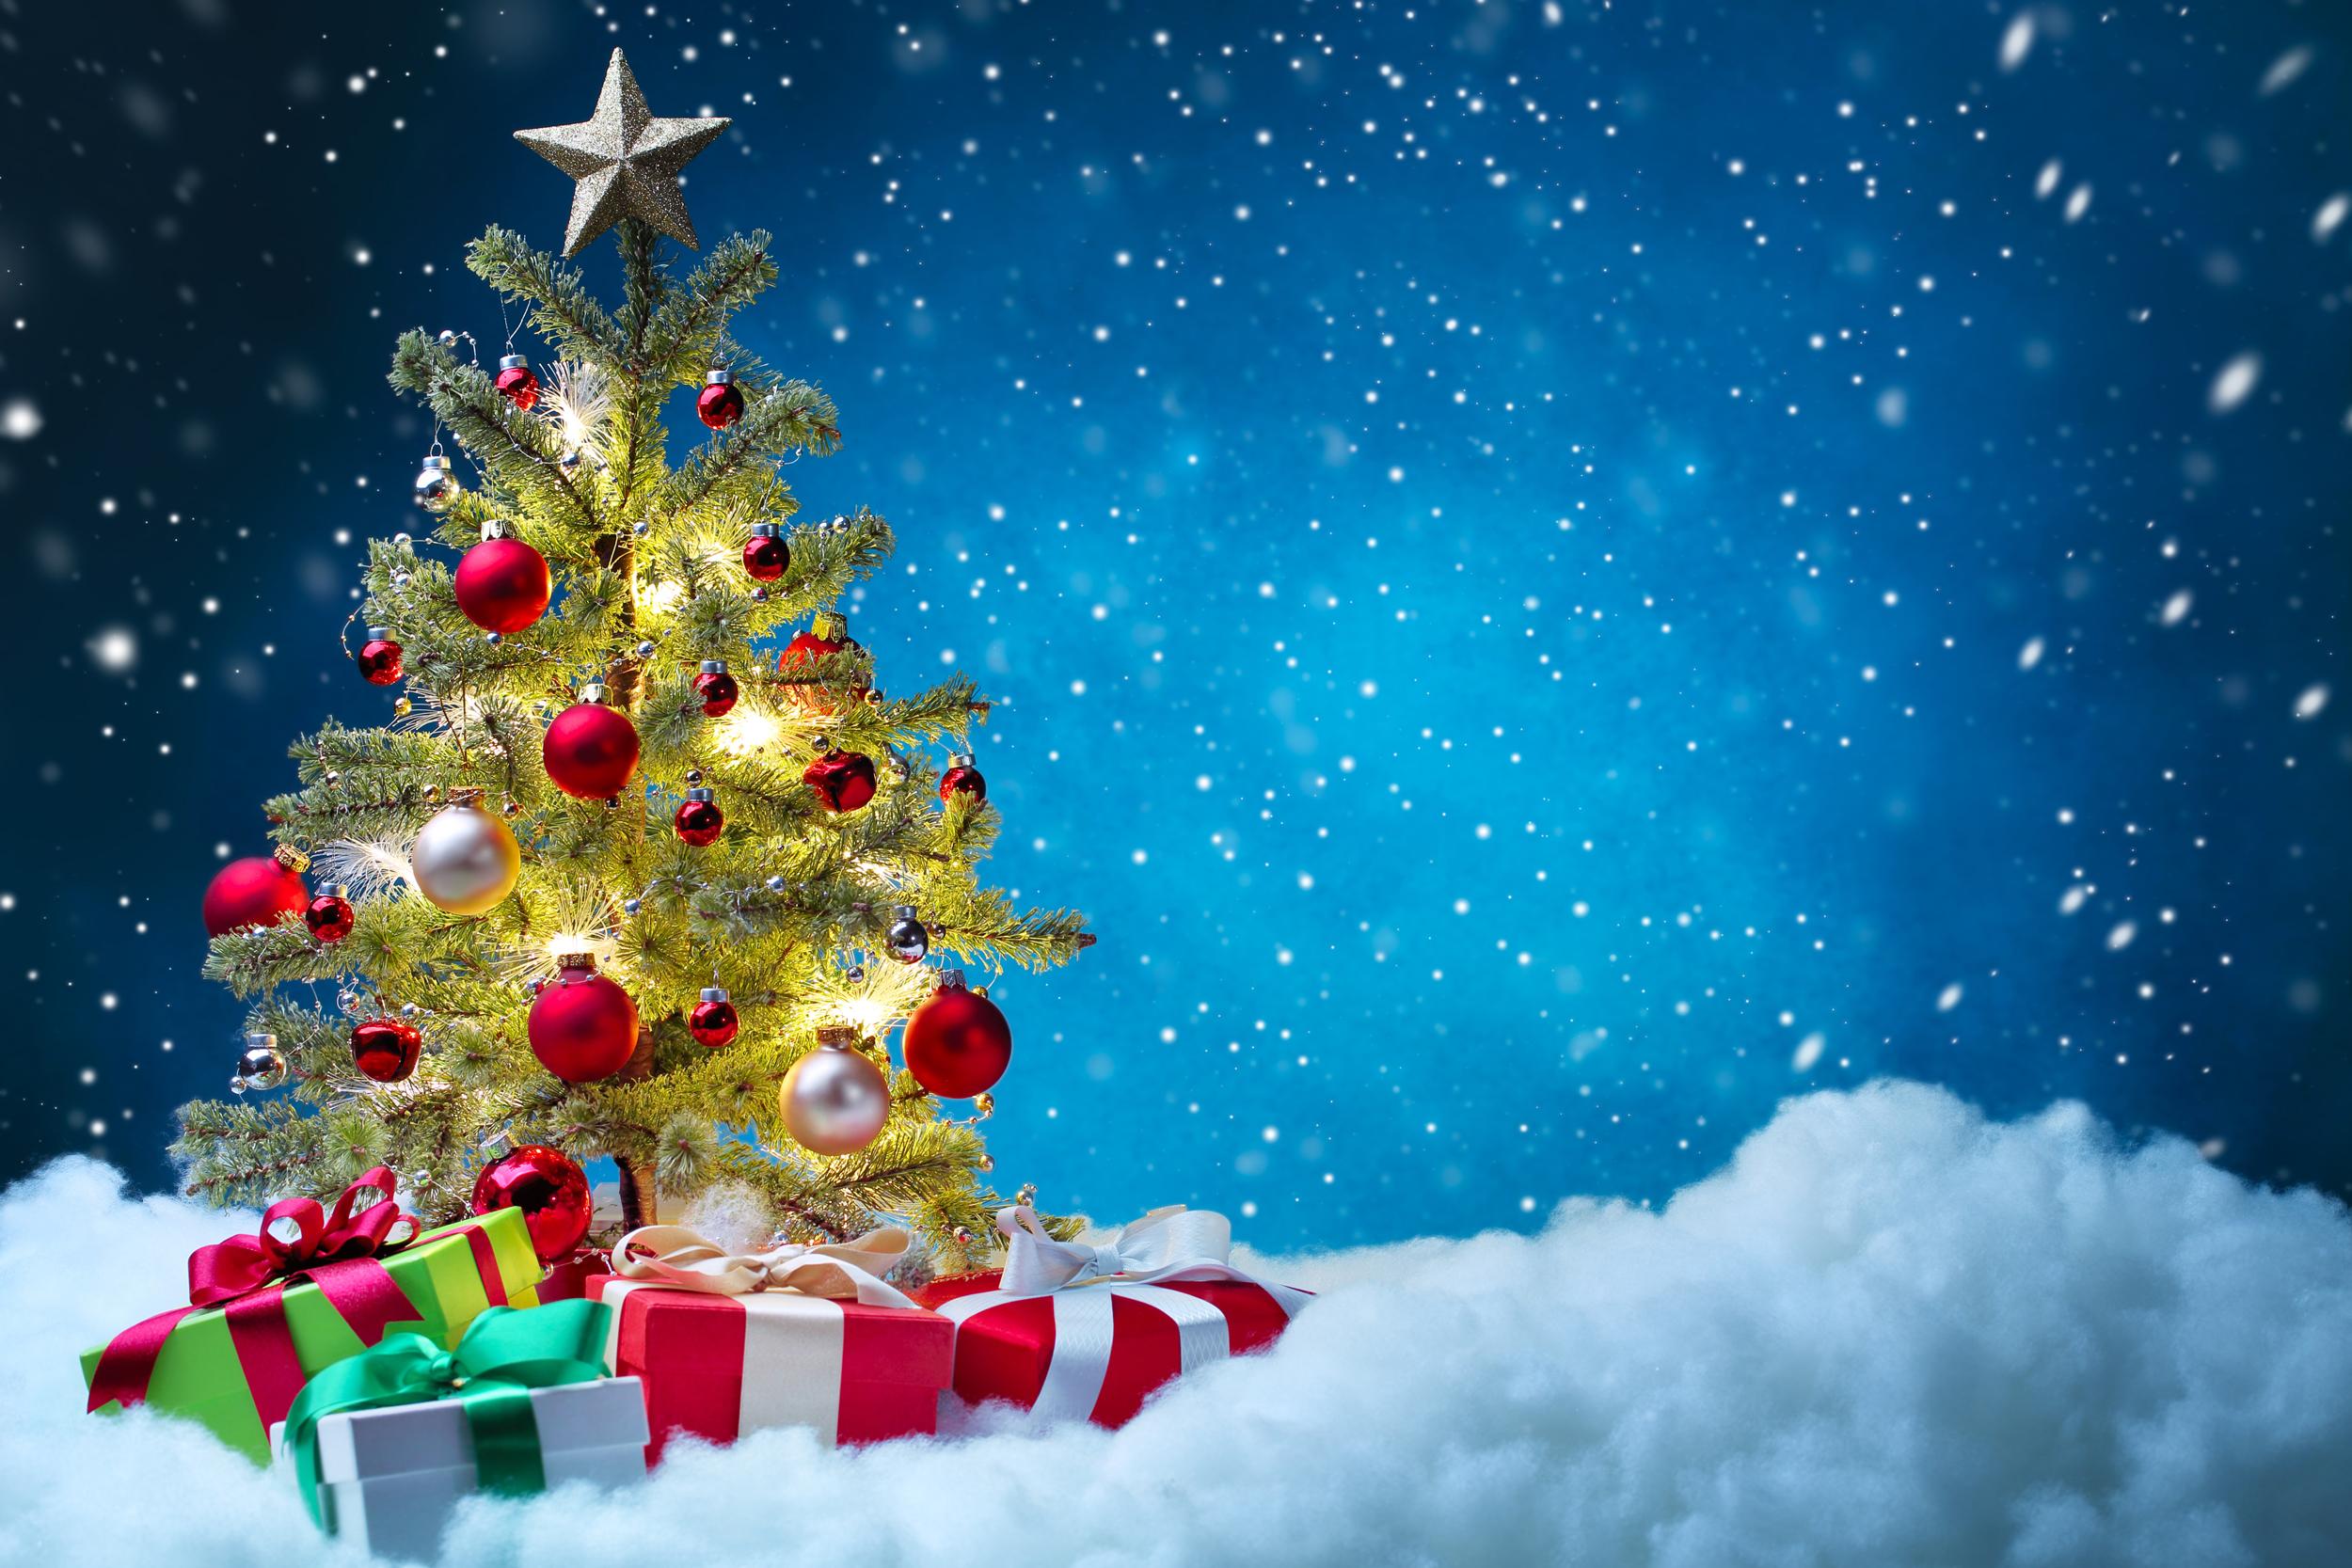 Navidad fondos de navidad wallpapers hd for Clipart natale free download